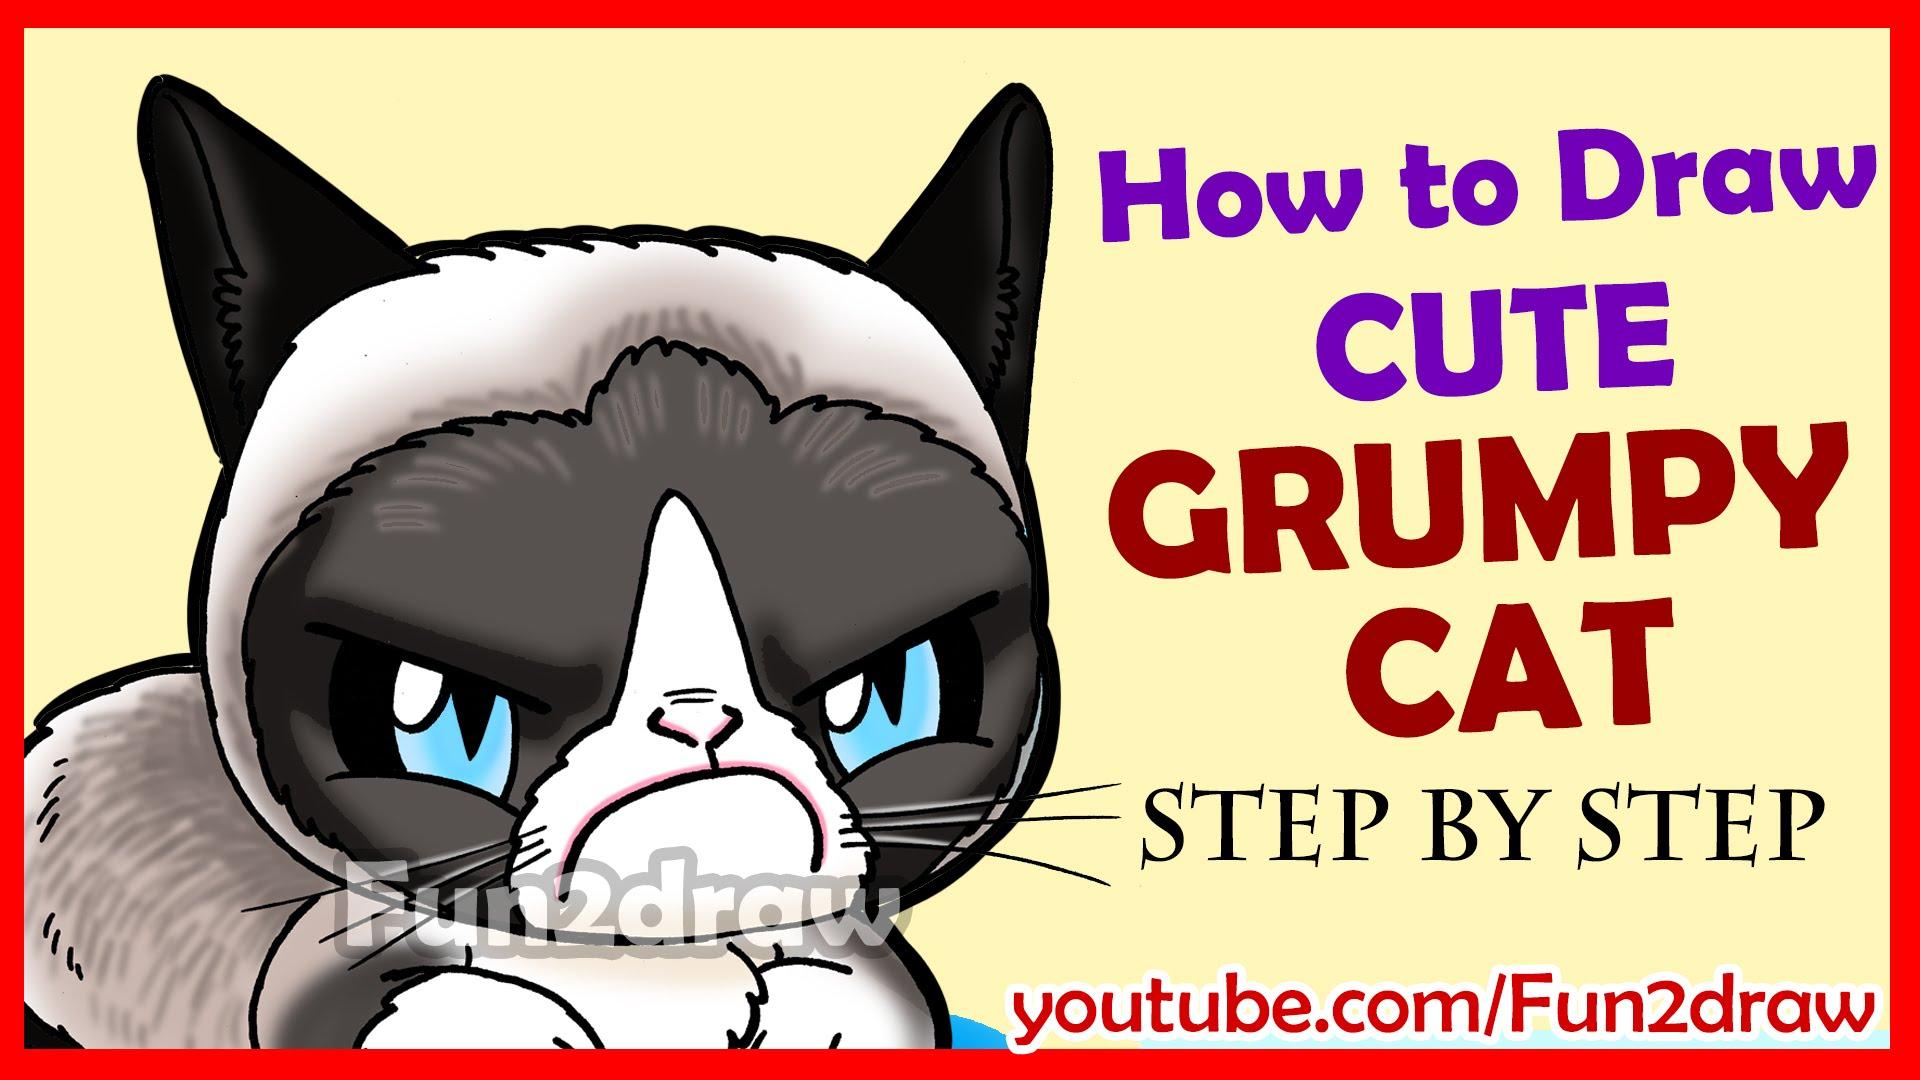 Drawn grumpy cat Cat Cute Grumpy to